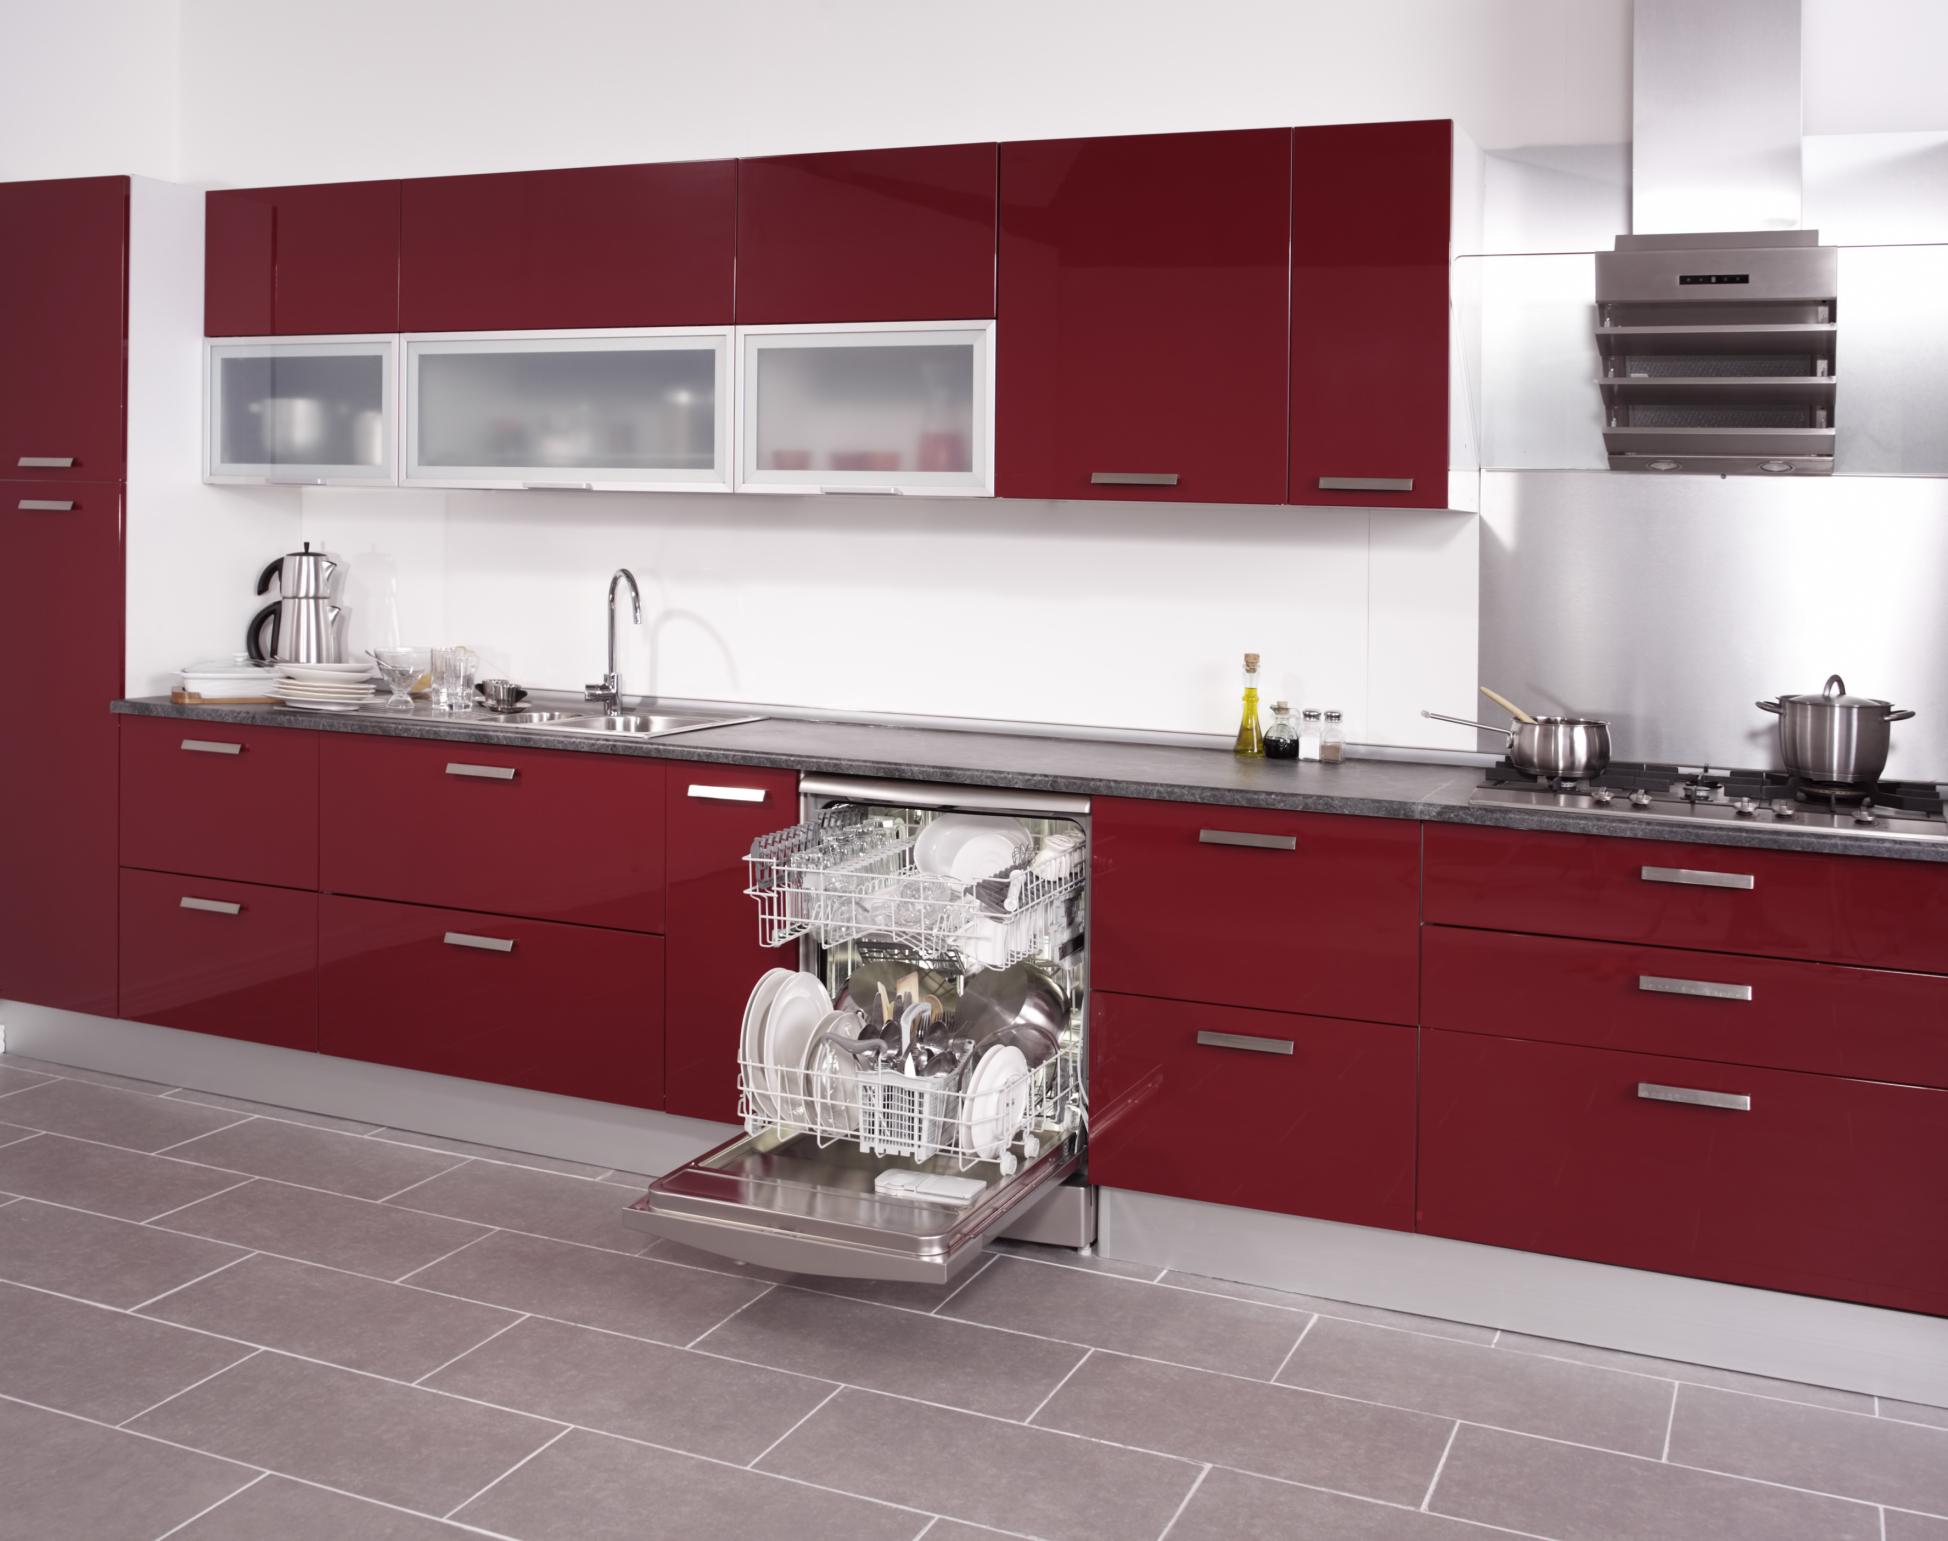 Wedding Gift Kitchen Appliances : Choosing kitchen appliances for your wedding gift registryArticles ...